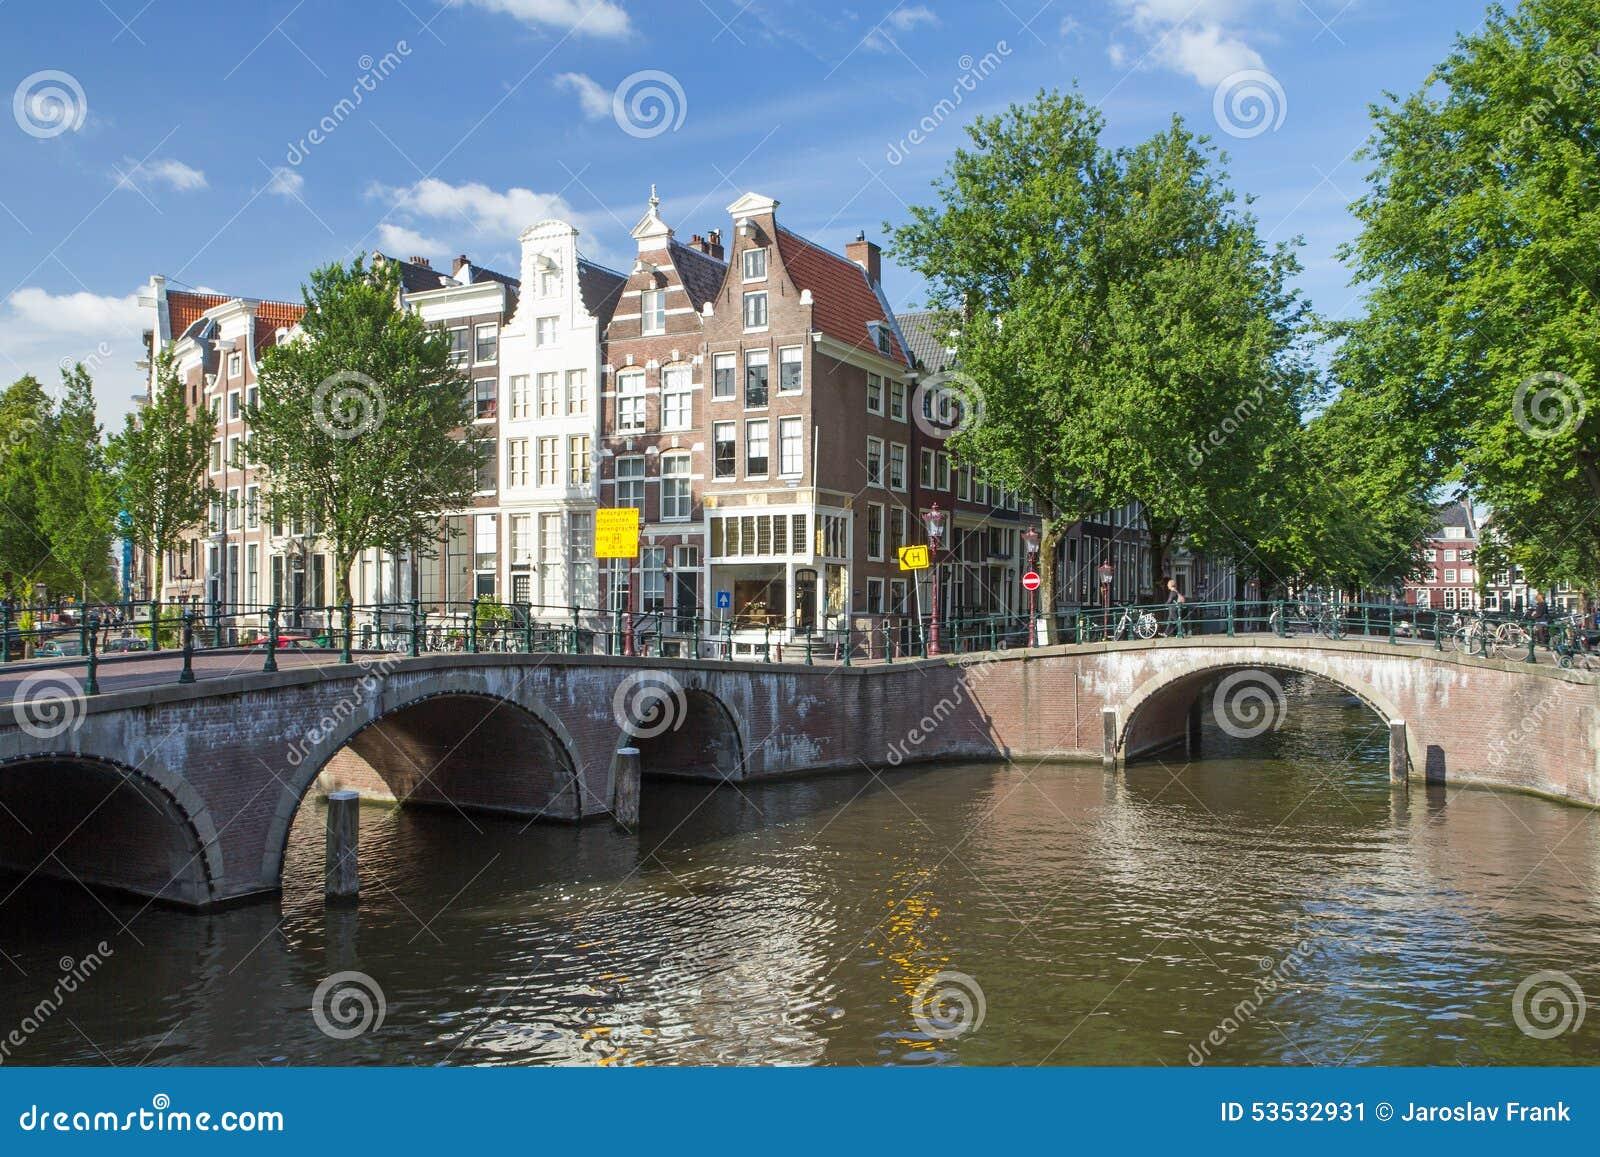 Famous seven bridges in amsterdam editorial photo image for Design bridge amsterdam